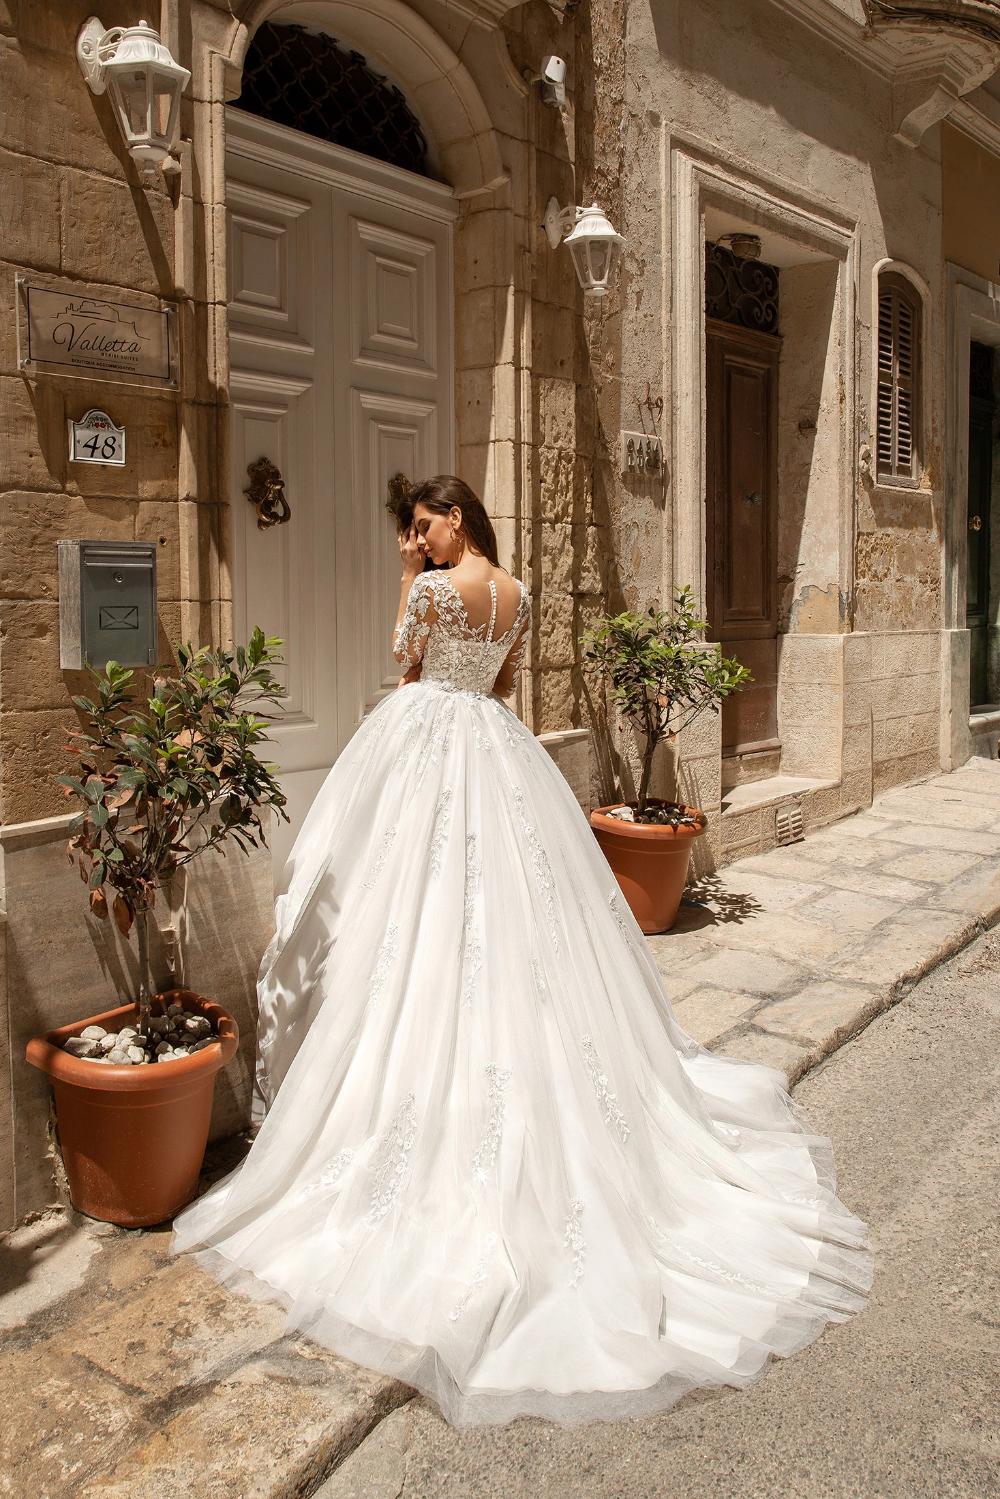 Mandy long sleeve ivory lace organza ball gown wedding dress – KC ...